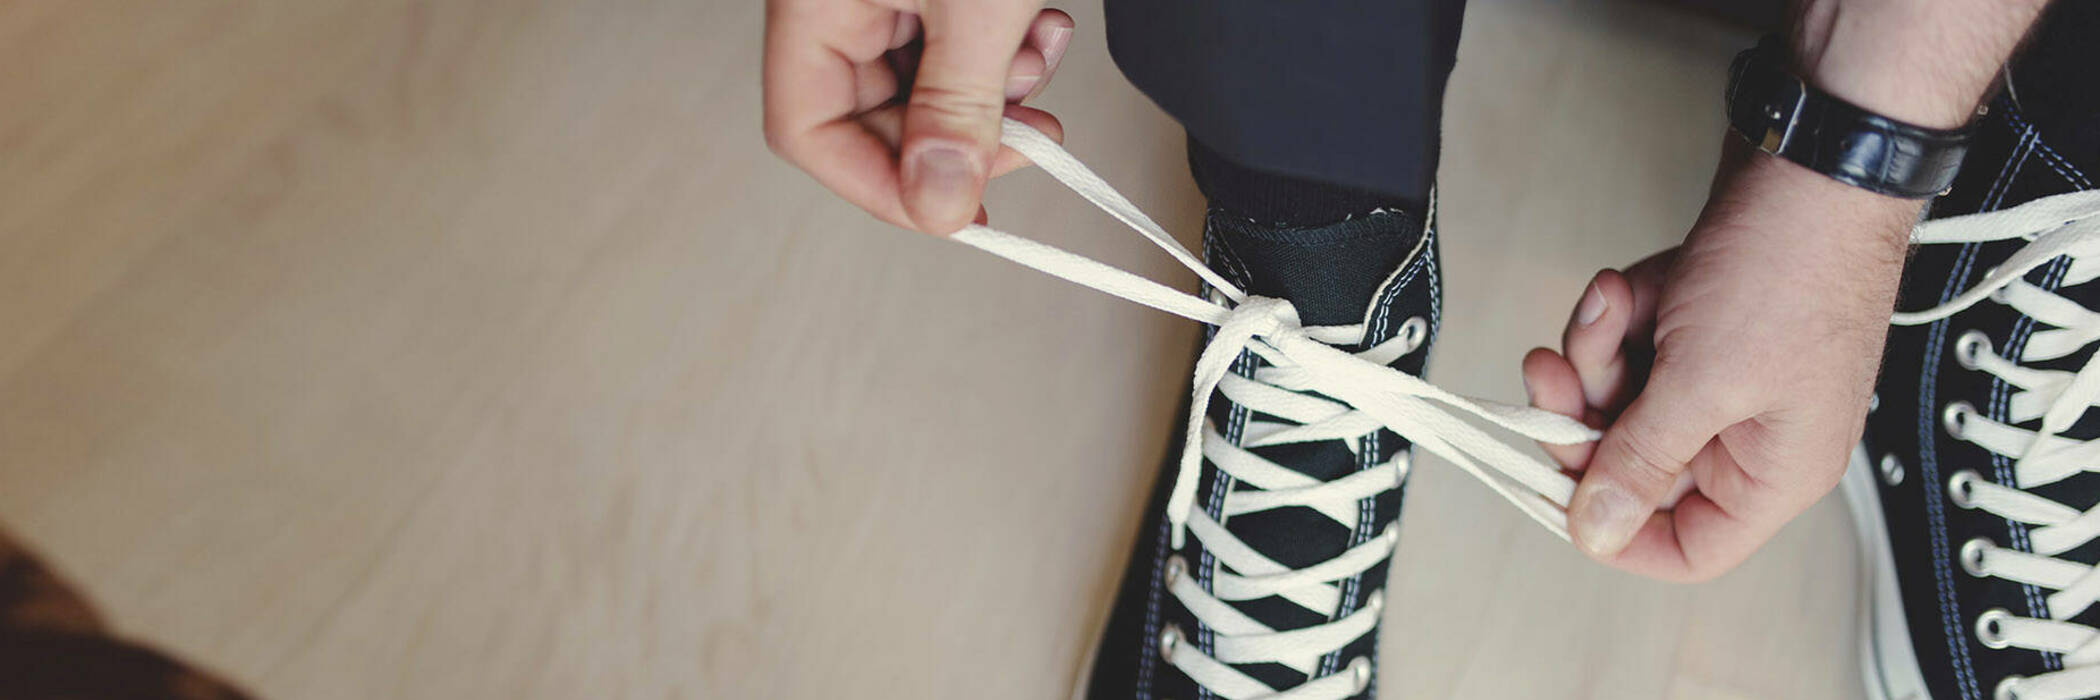 15oct shoe tying lifehack hero